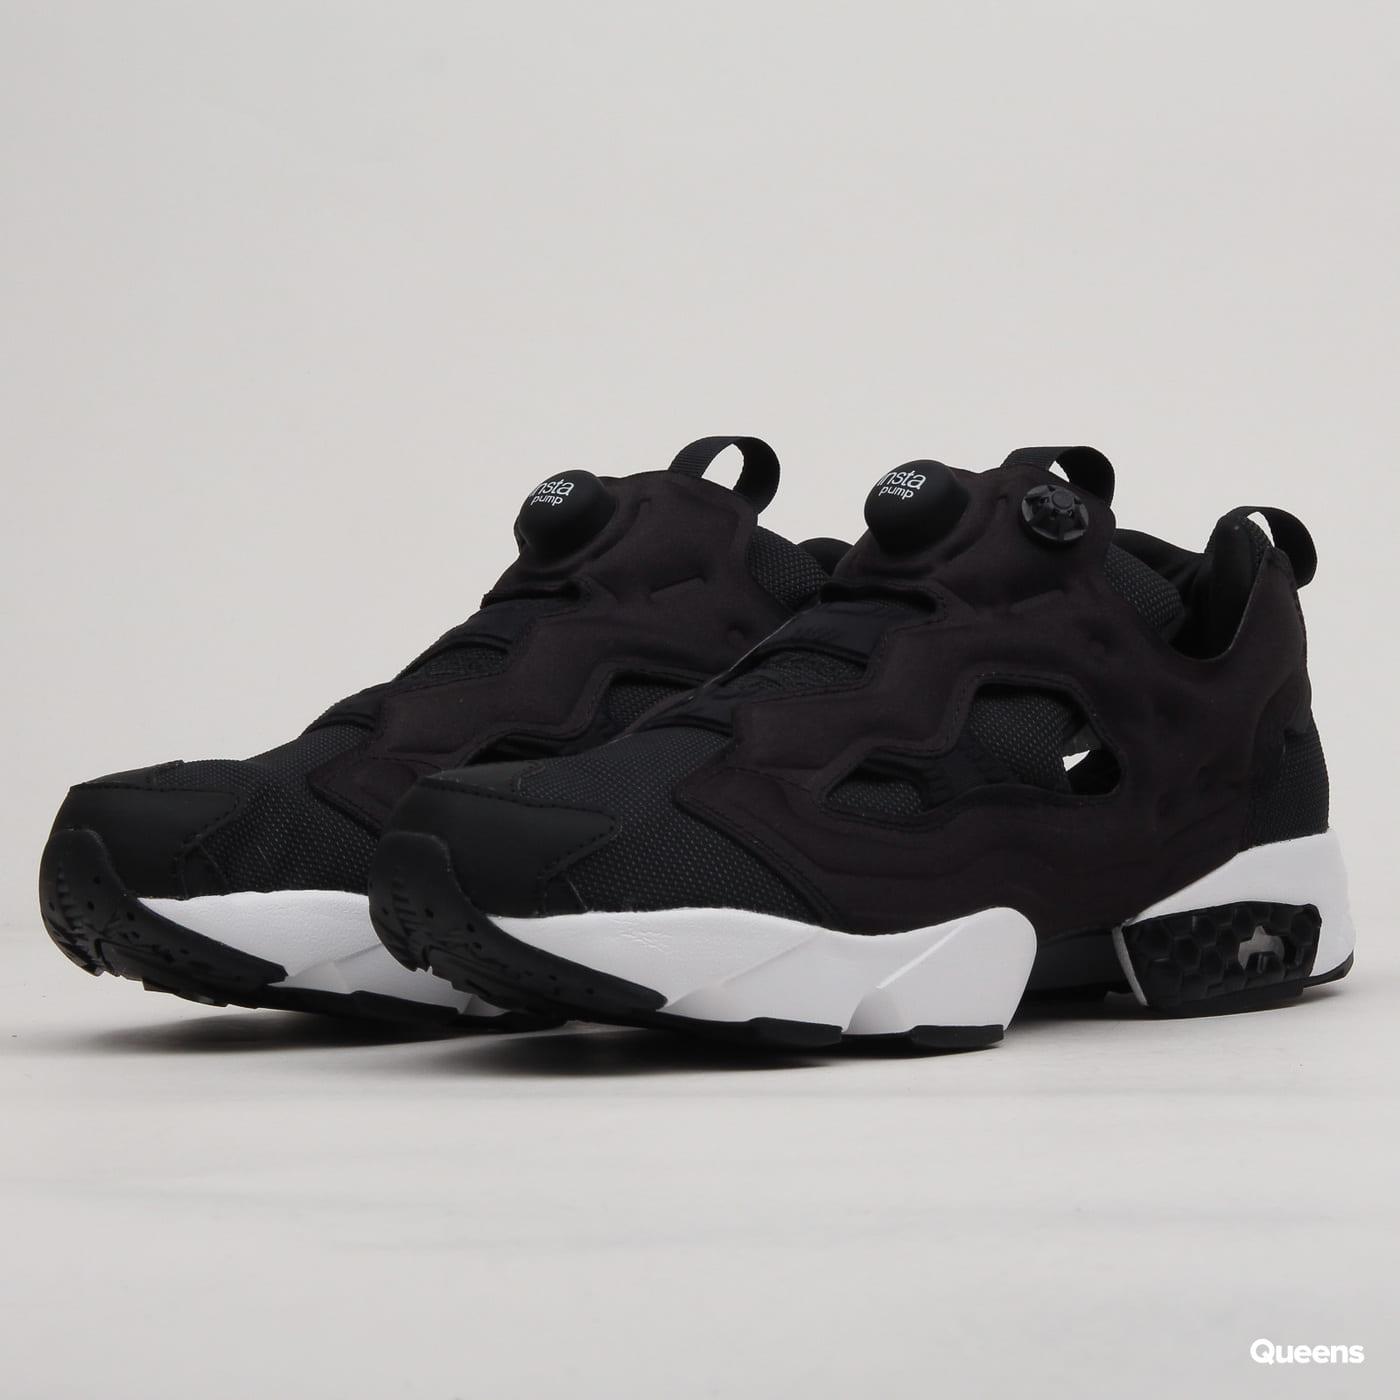 e4f4e131848 Sneakers Reebok Instapump Fury OG MU black / white (DV6985) – Queens 💚